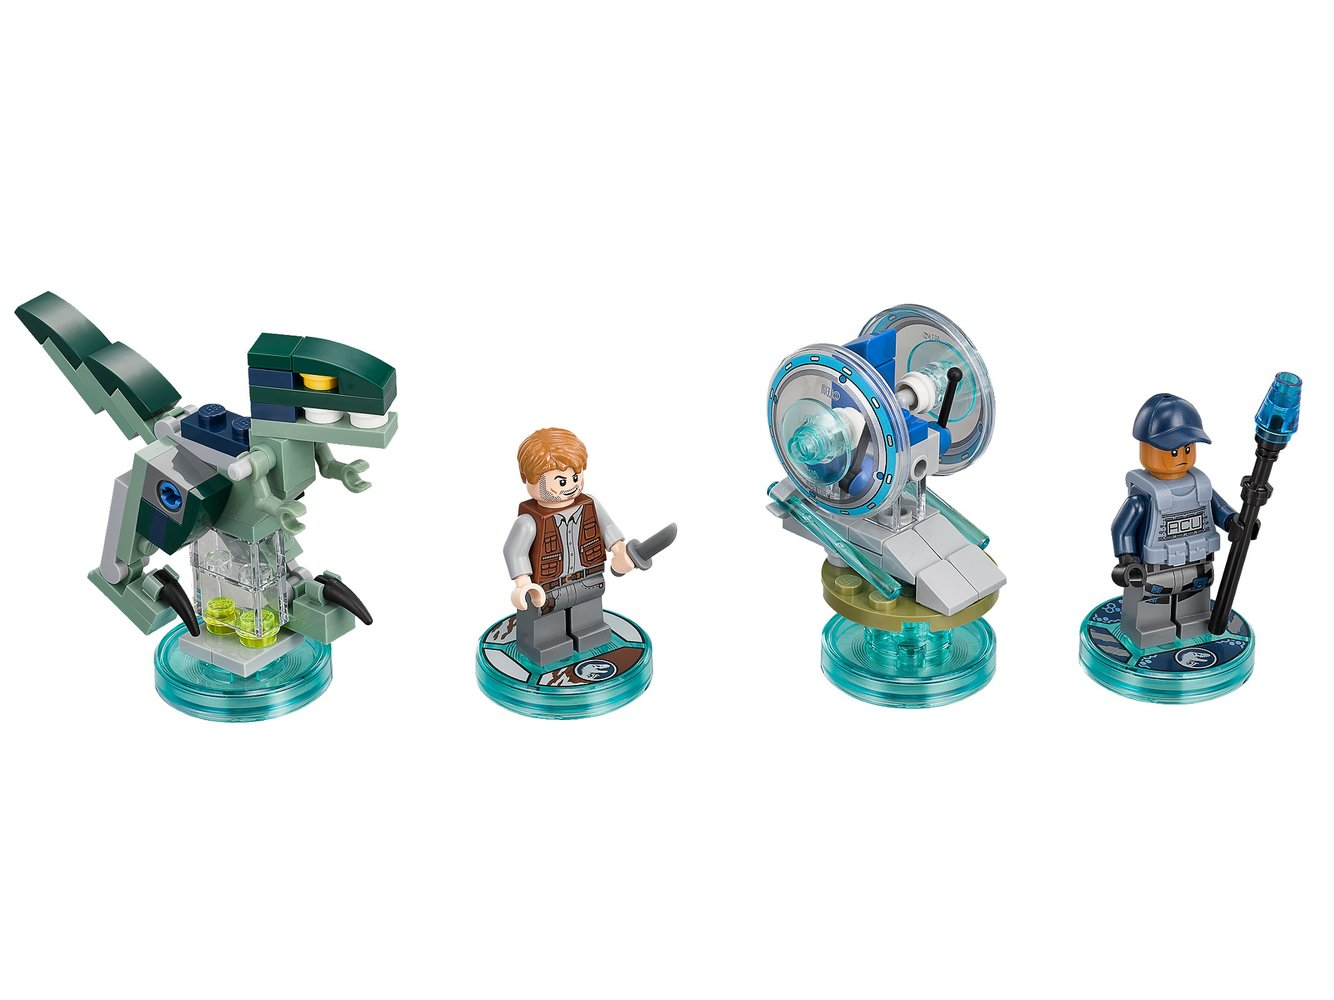 Jurassic World Team Pack